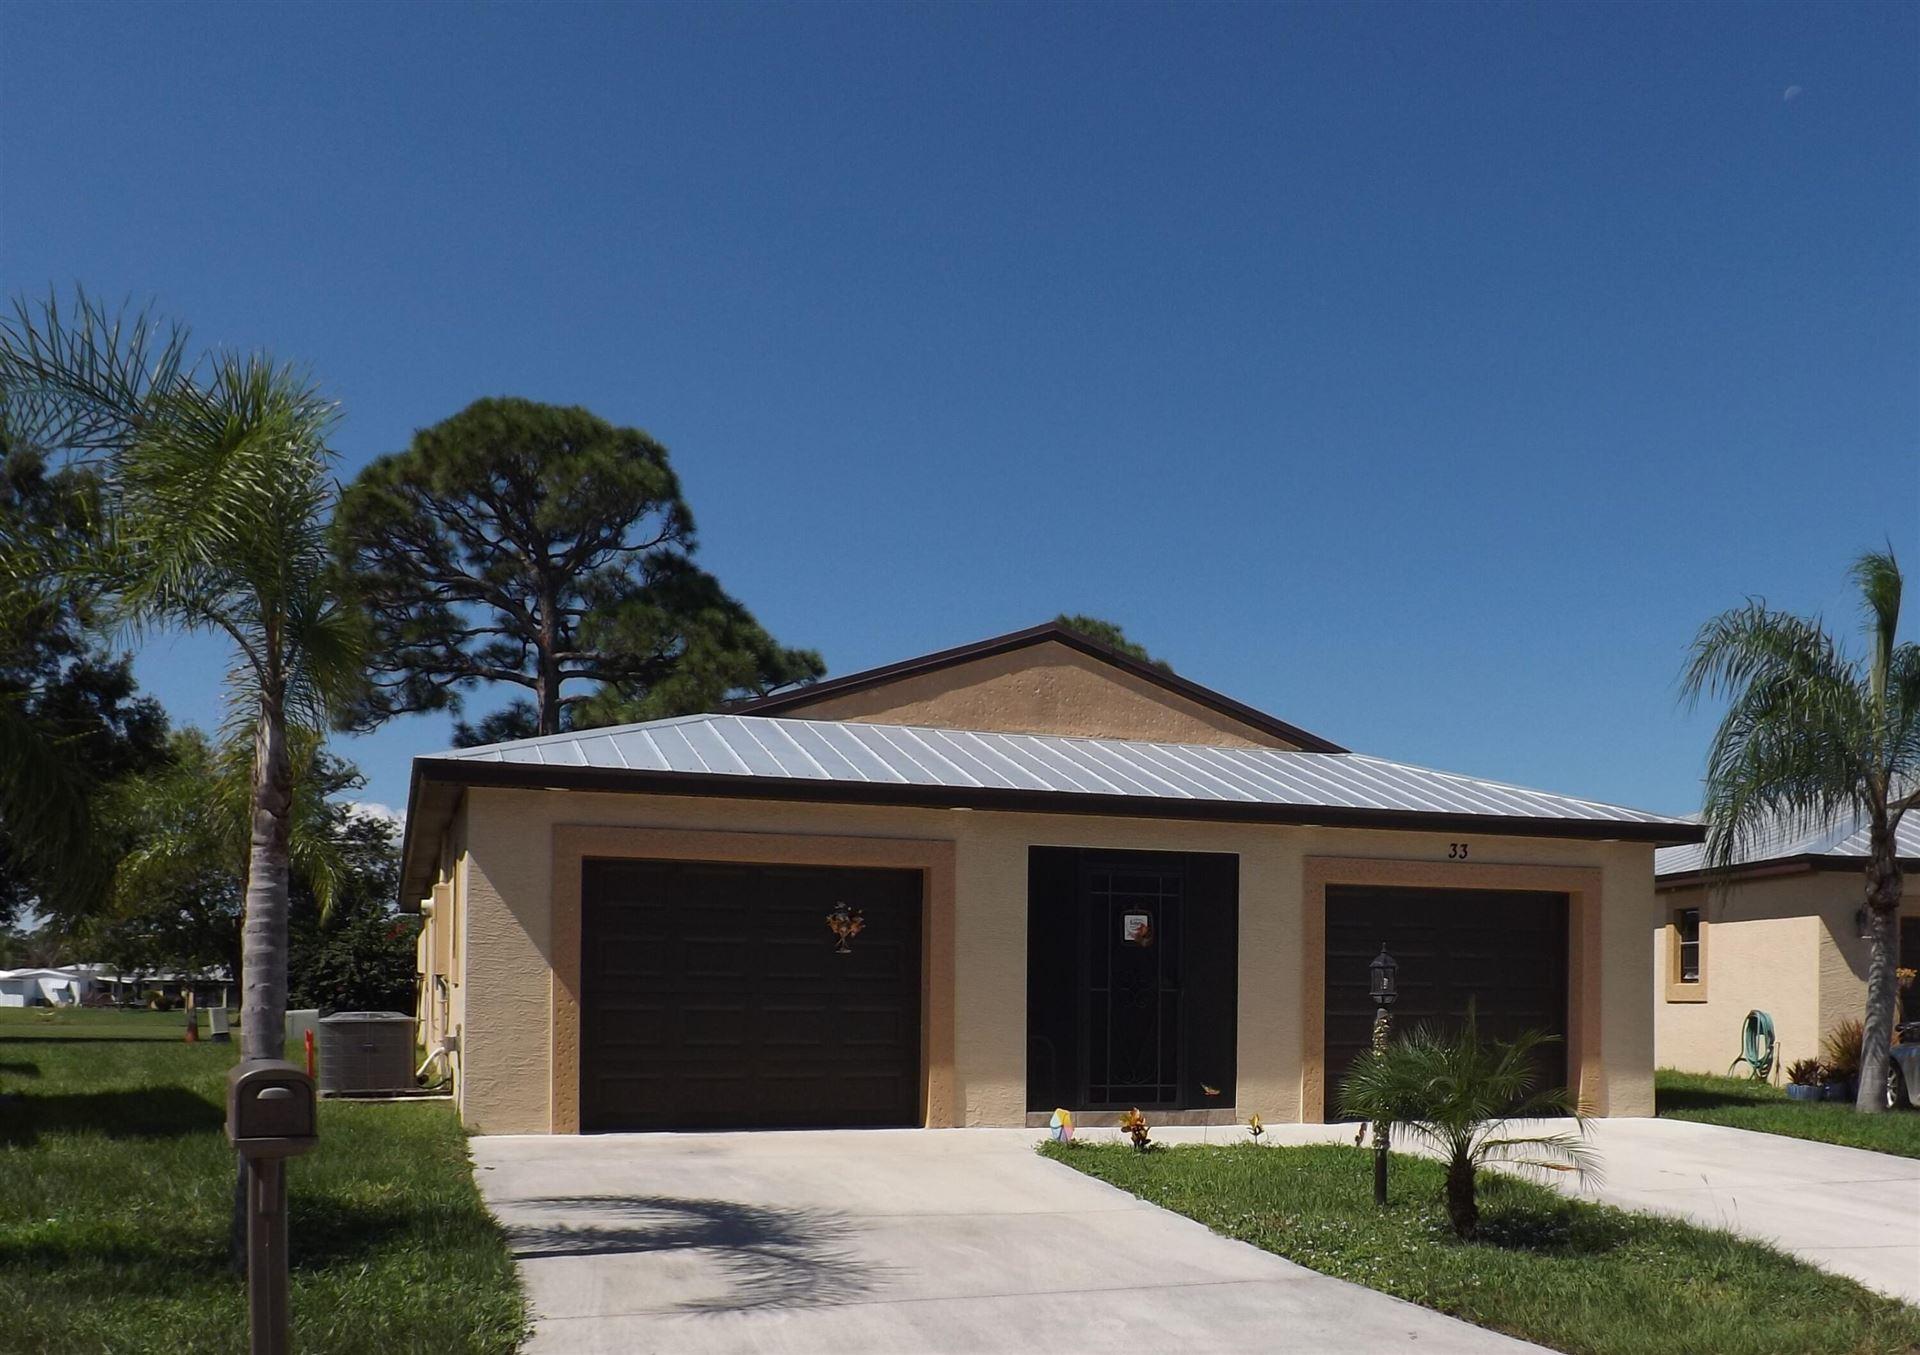 33 Las Casitas, Fort Pierce, FL 34951 - MLS#: RX-10749593